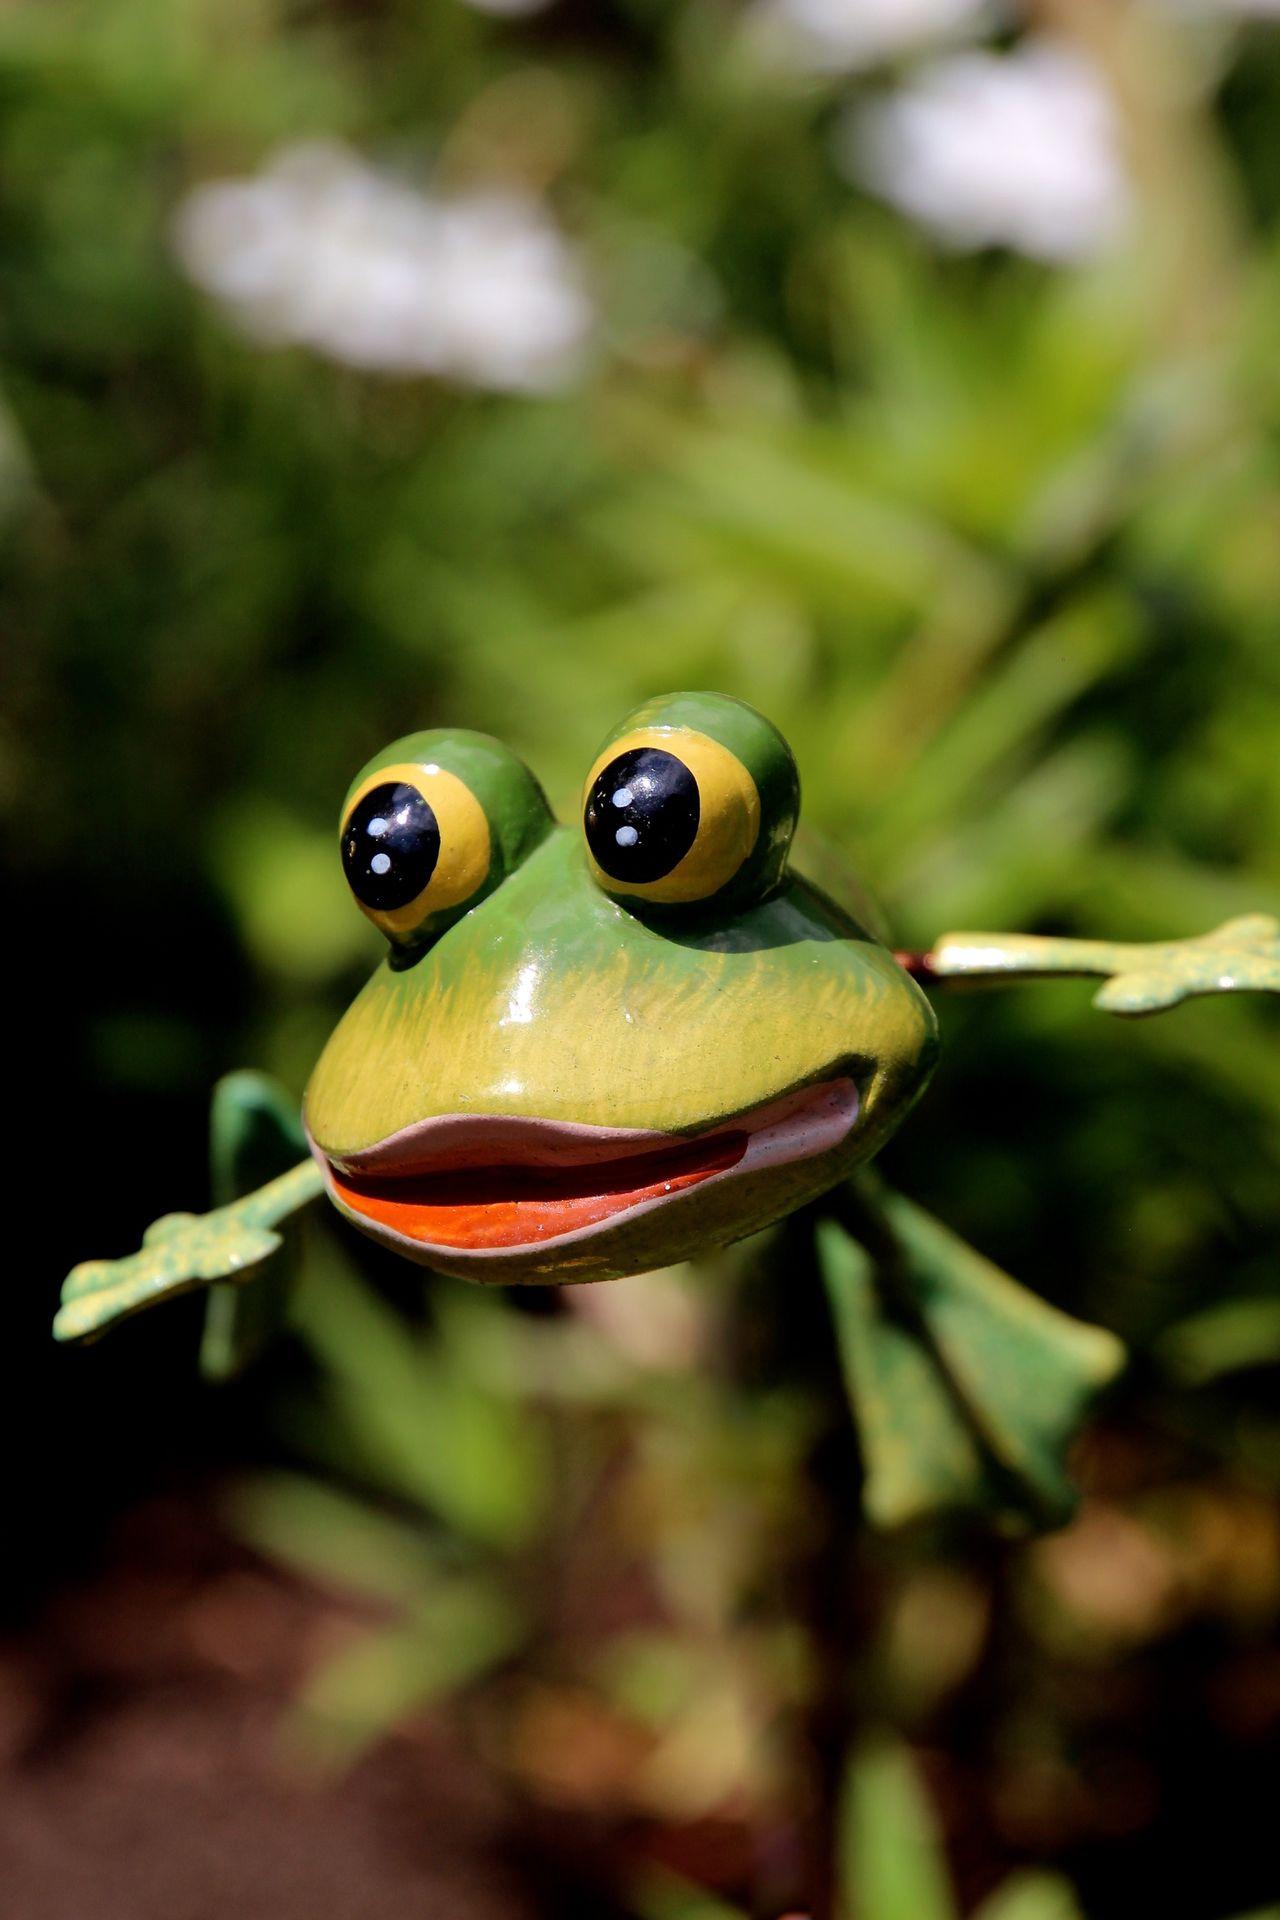 Frog Macro_collection Macroclique Secret Garden AMPt_community Macro Photography EyeEm Masterclass Getting Inspired Taking Photos EyeEm Best Shots